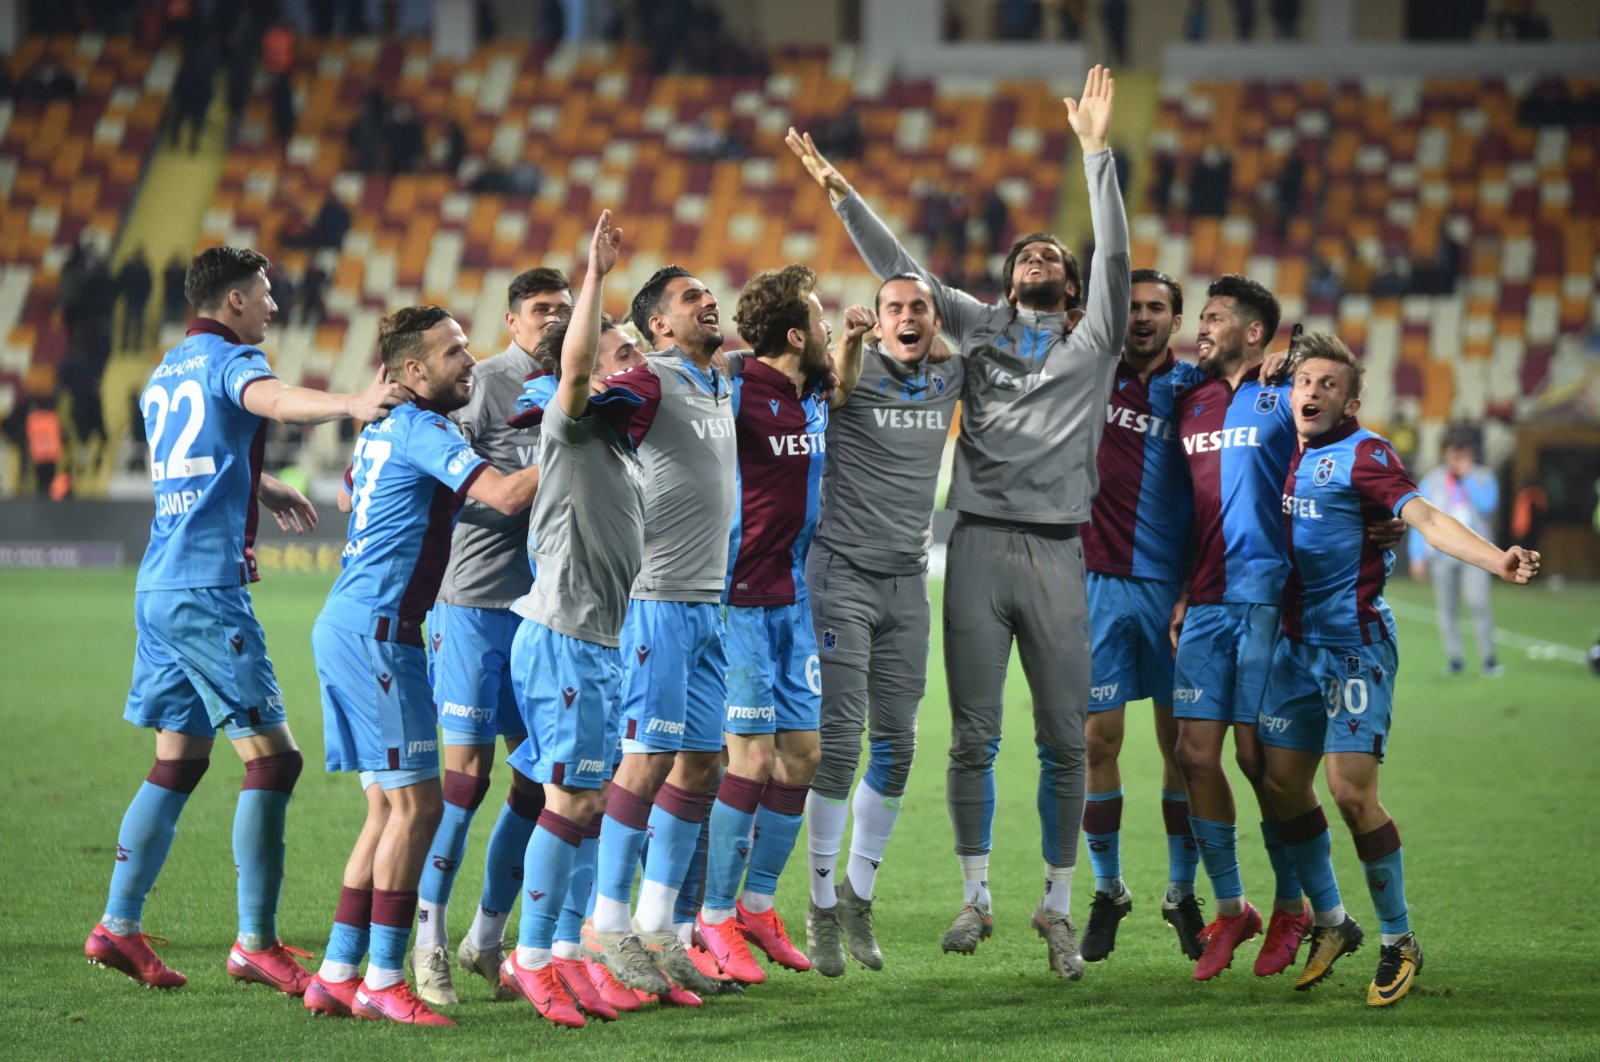 Trabzonspor players celebrate a victory over Yeni Malatyaspor in Malatya, Turkey, March 12, 2020. (İHA Photo)